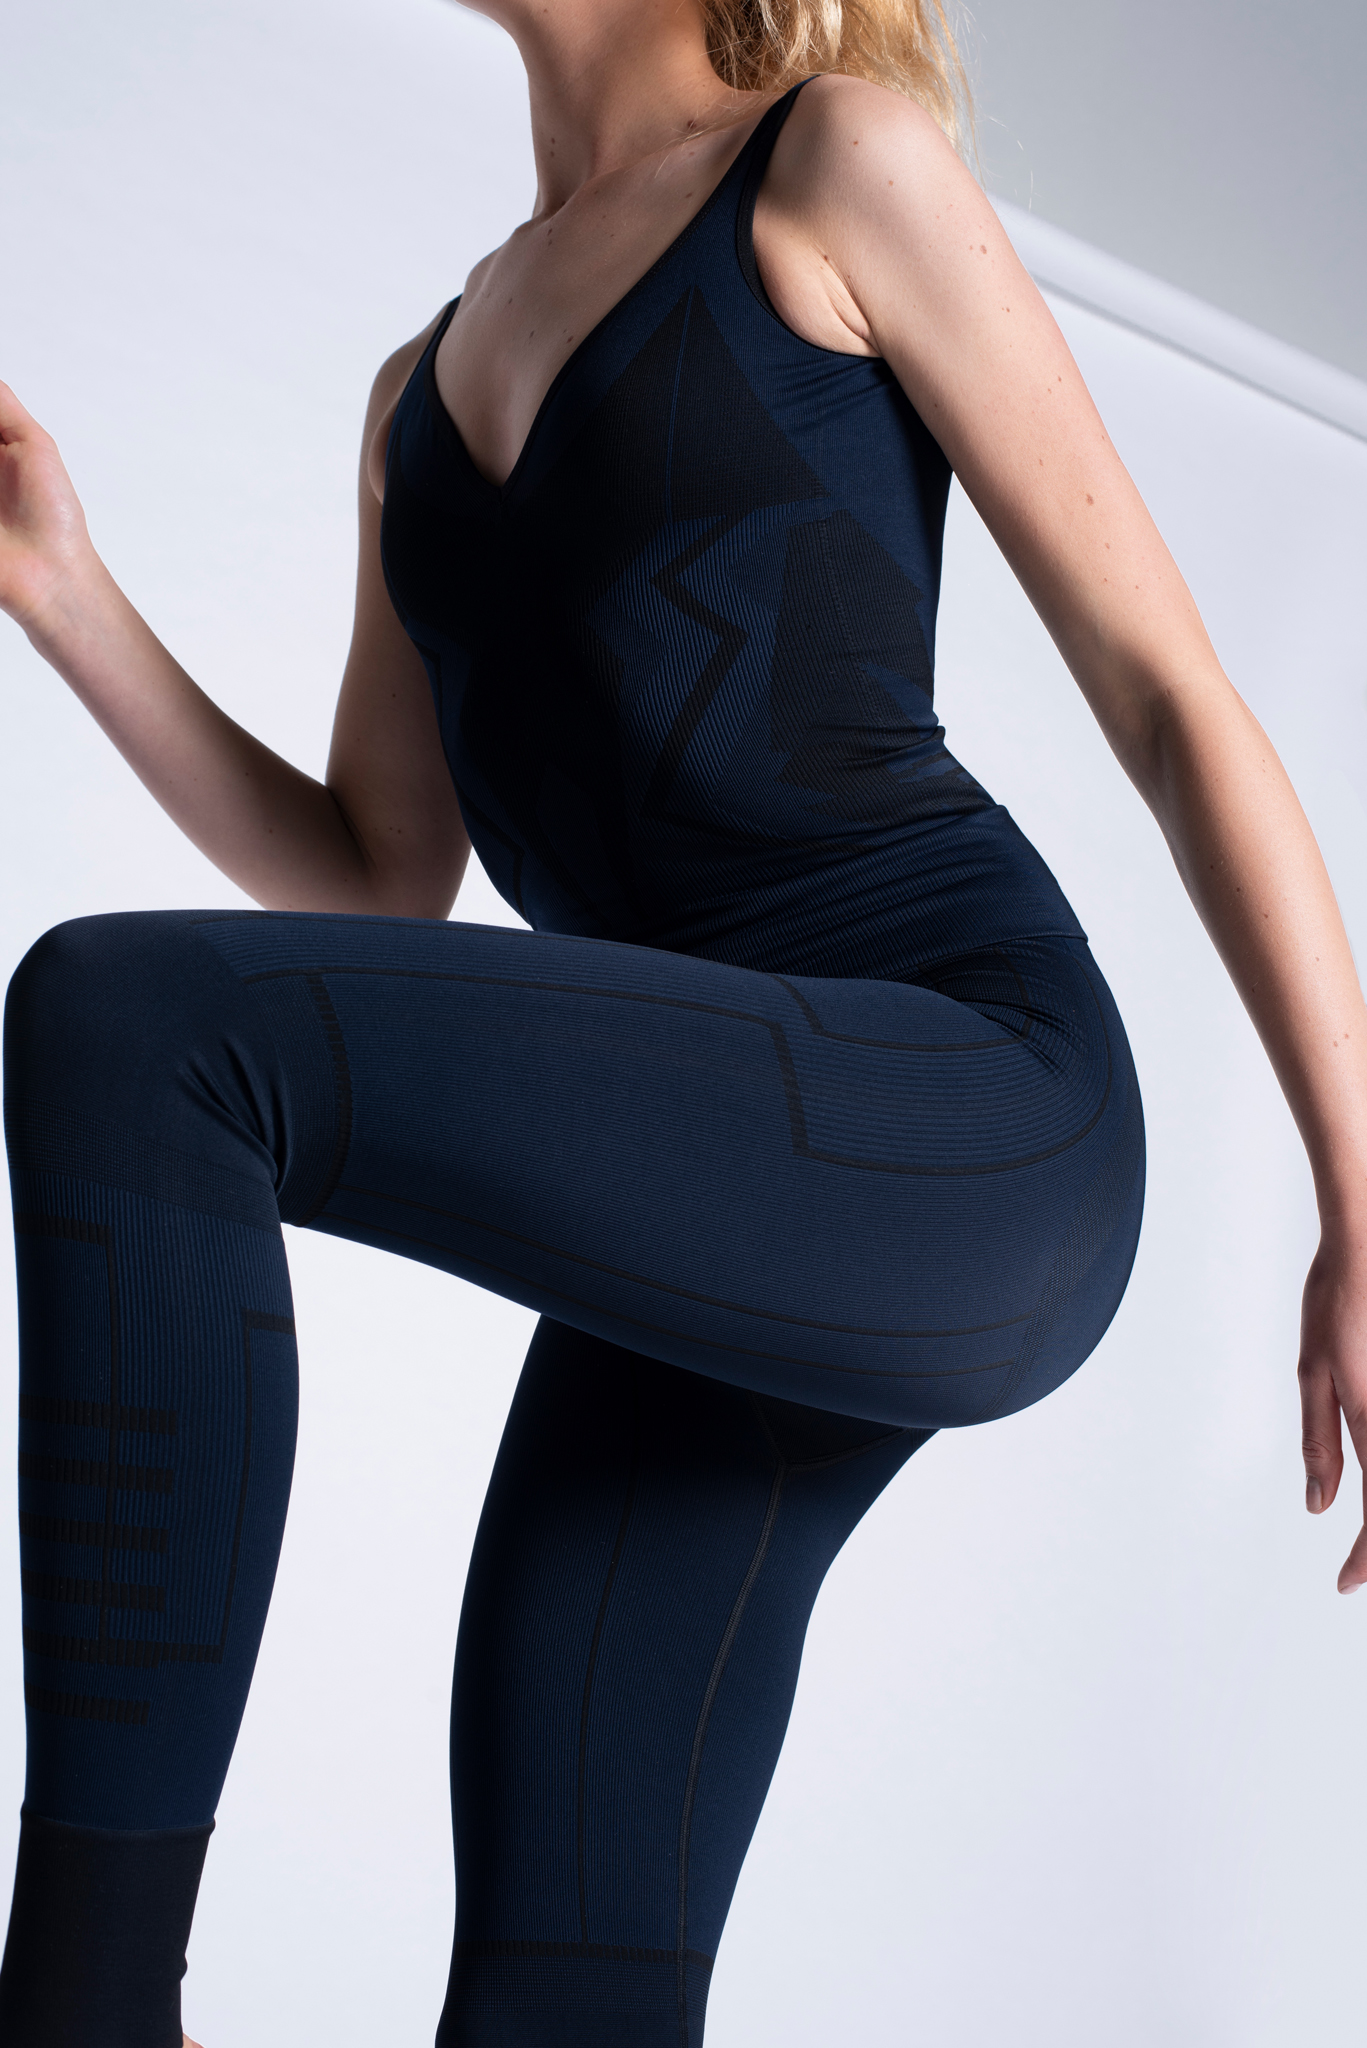 Evona Doamnelor chilotei clasice K 178 corp XL